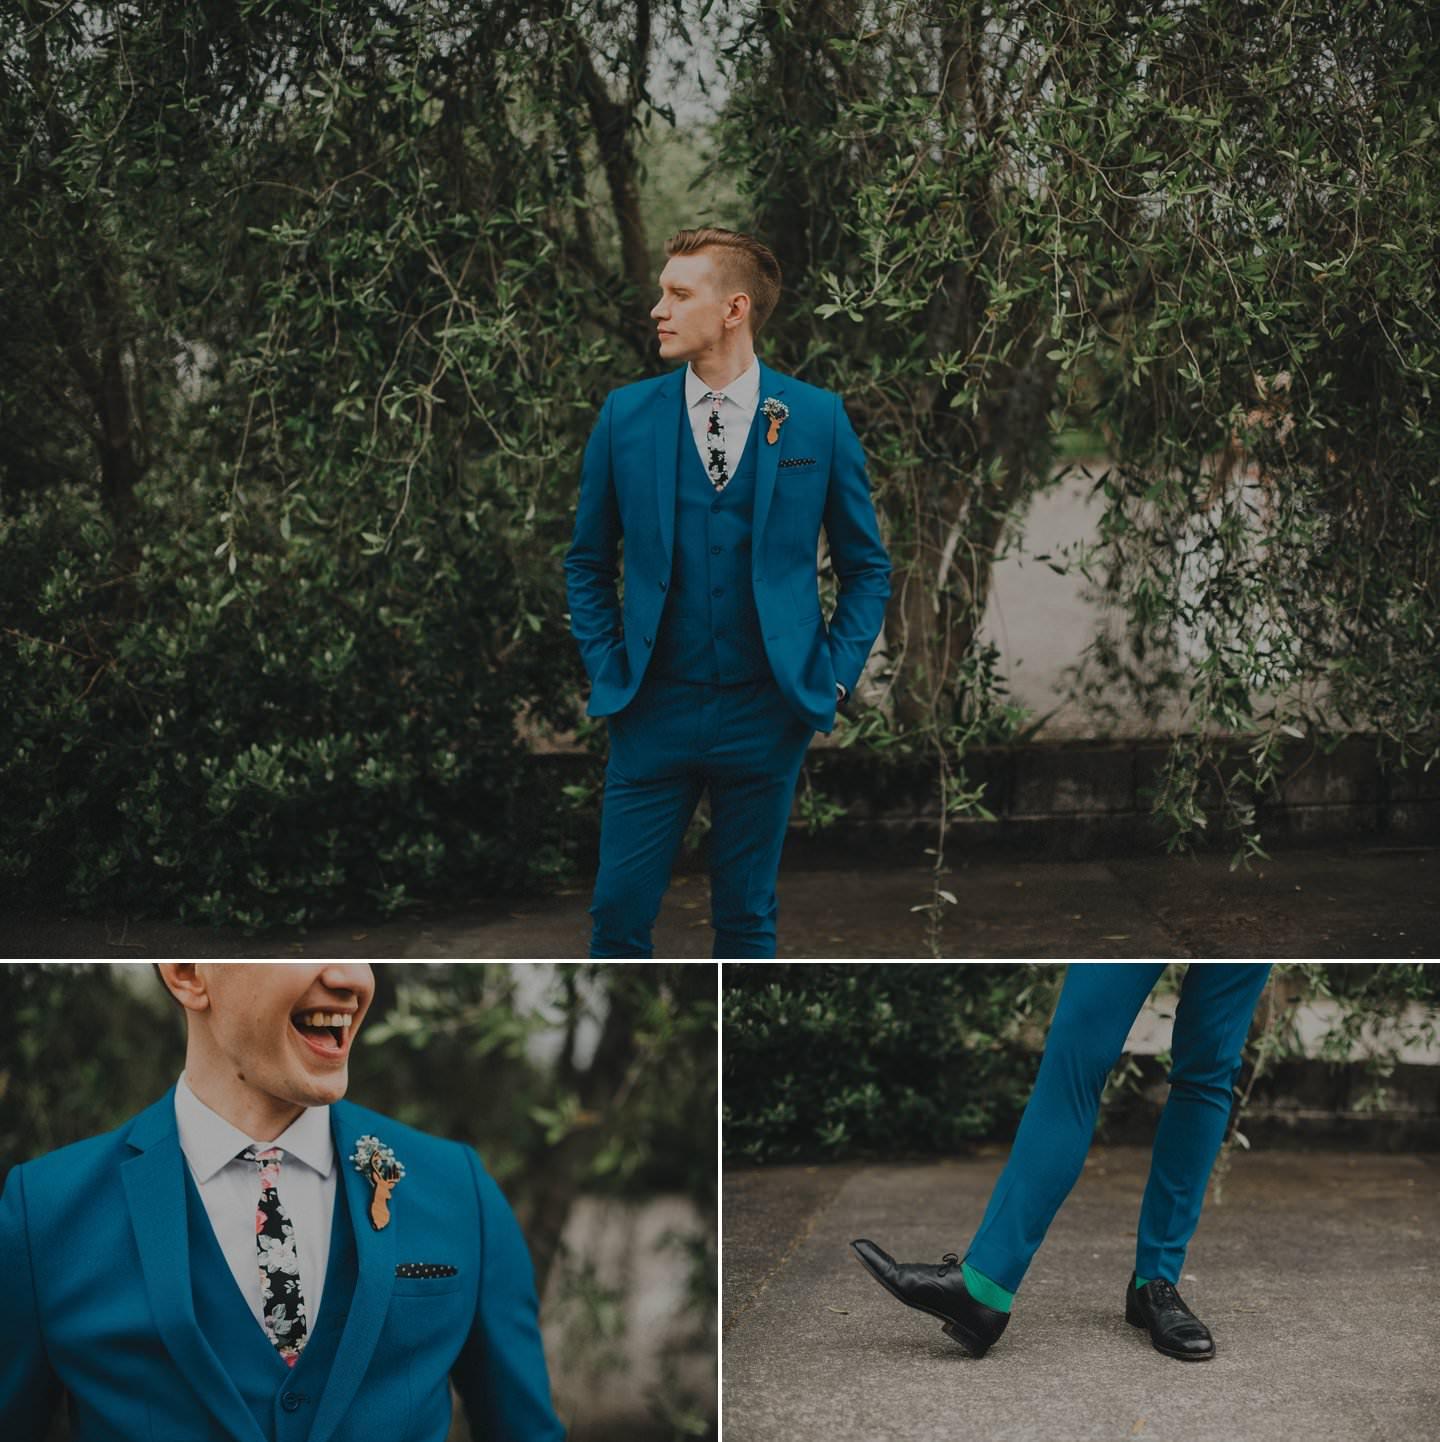 Stylish alternative groom in cobalt blue suit